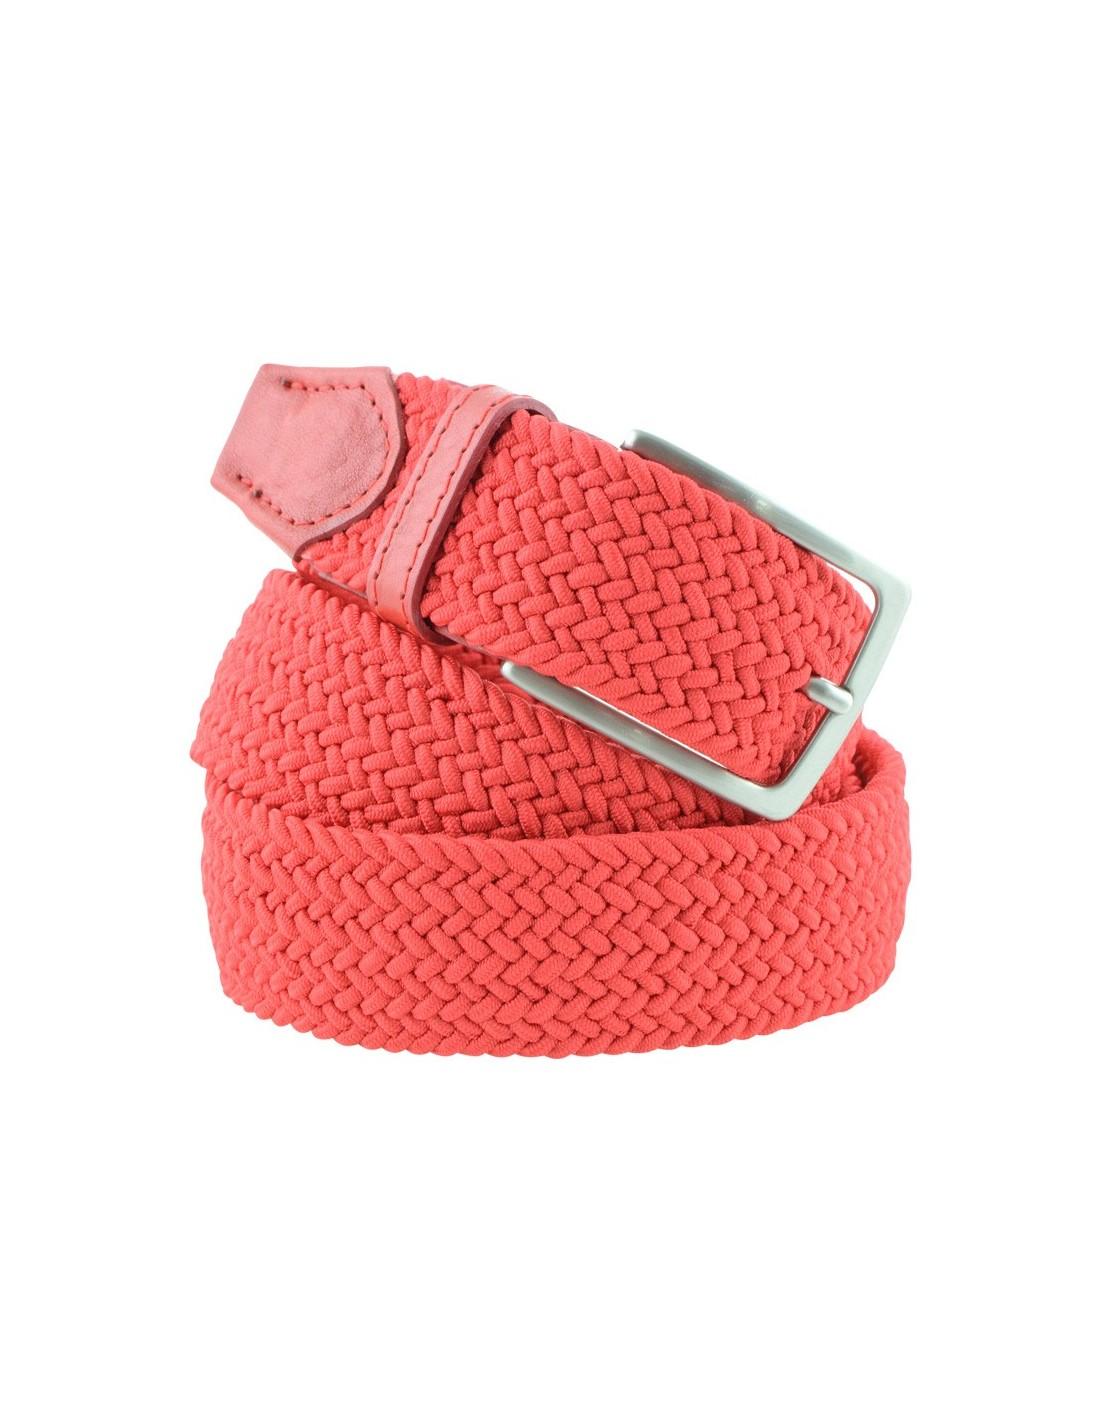 l'ultimo bd3b1 8880c Cintura elastica uomo intrecciata rossa